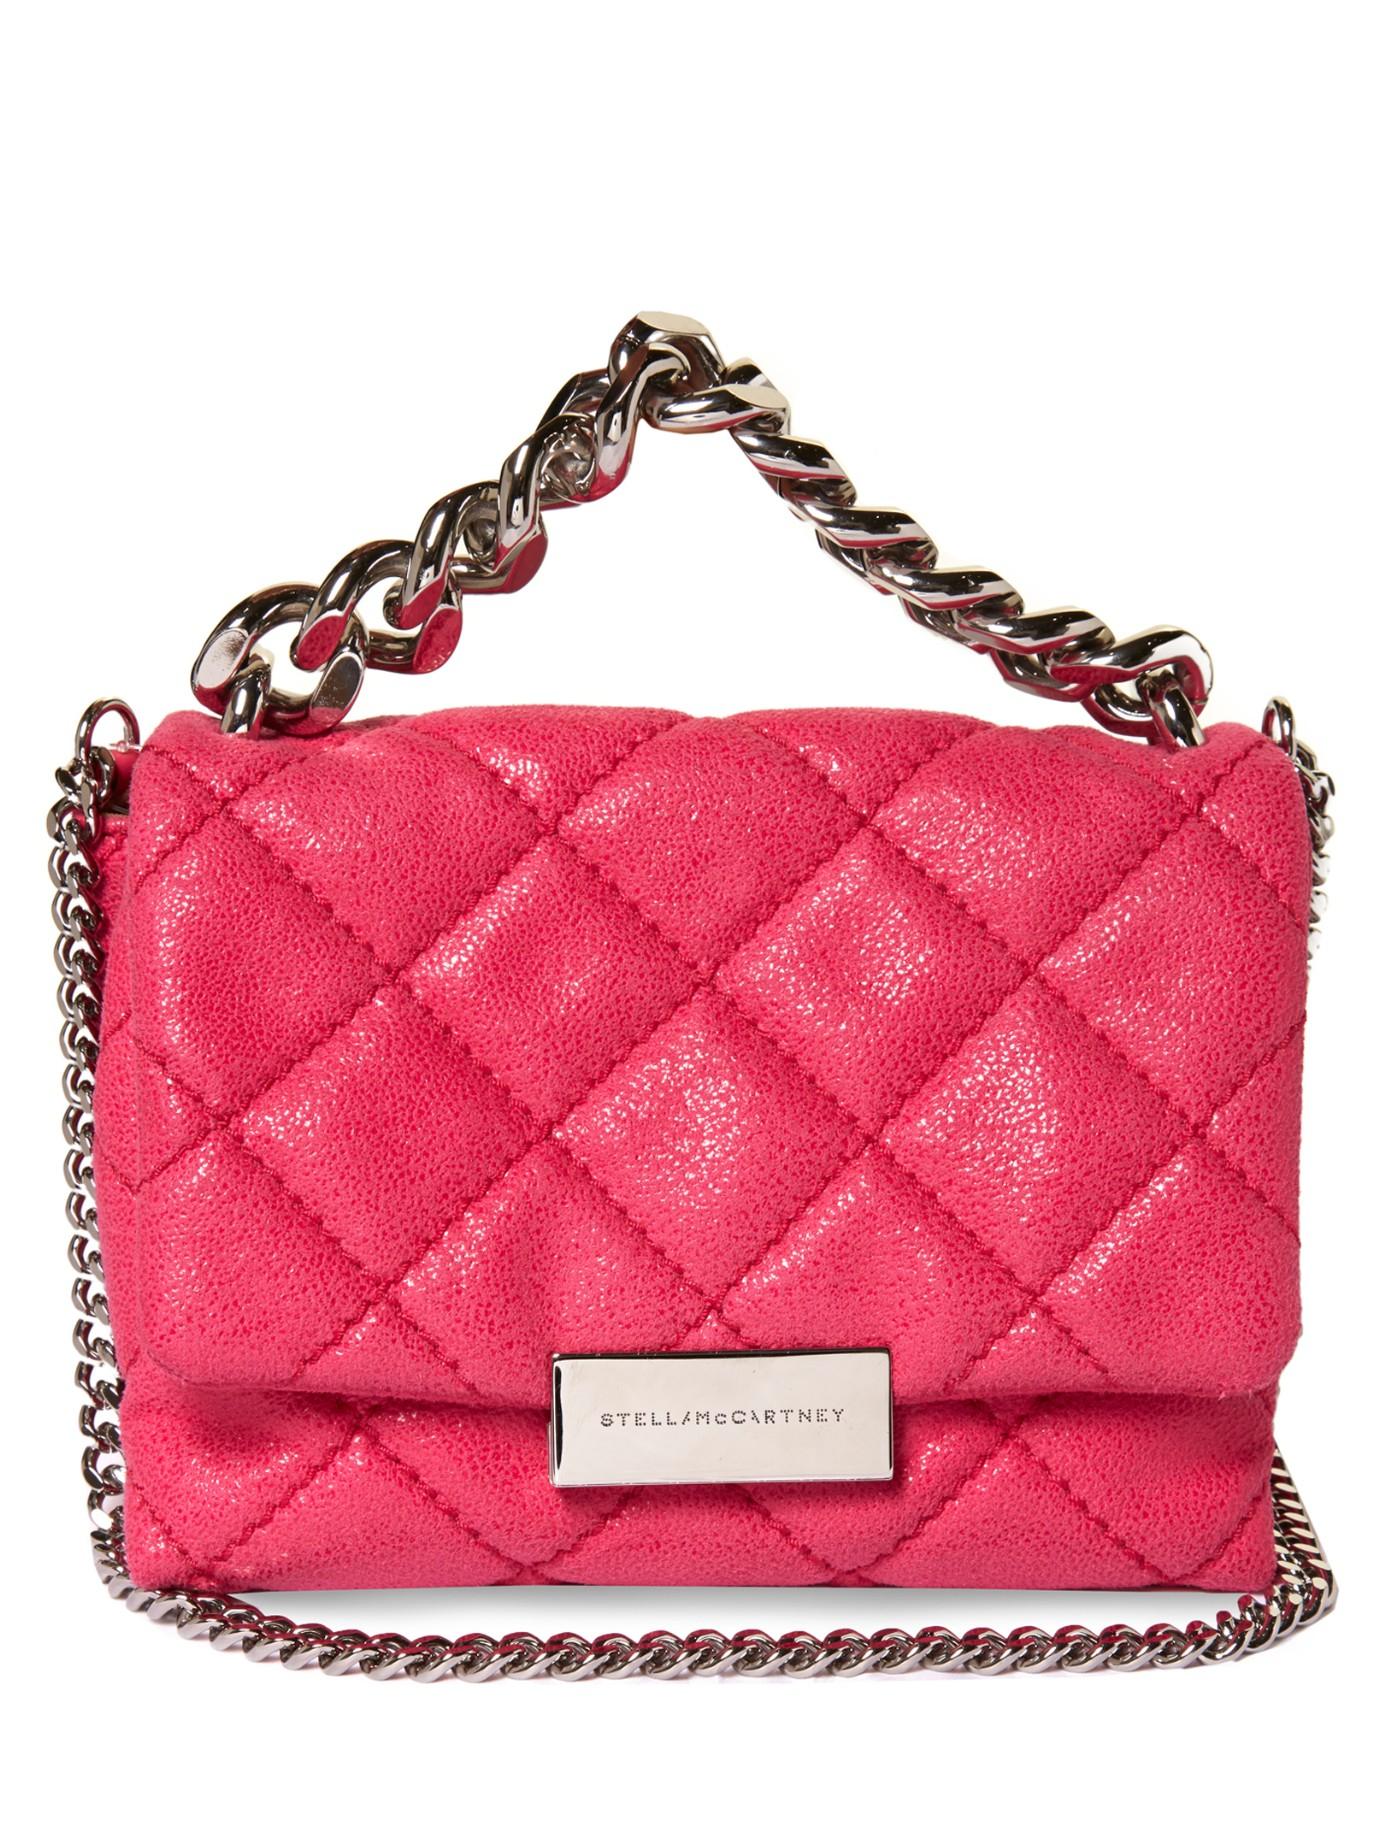 Lyst - Stella McCartney Beckett Mini Faux-suede Cross-body Bag in Pink 734e6b21a457a